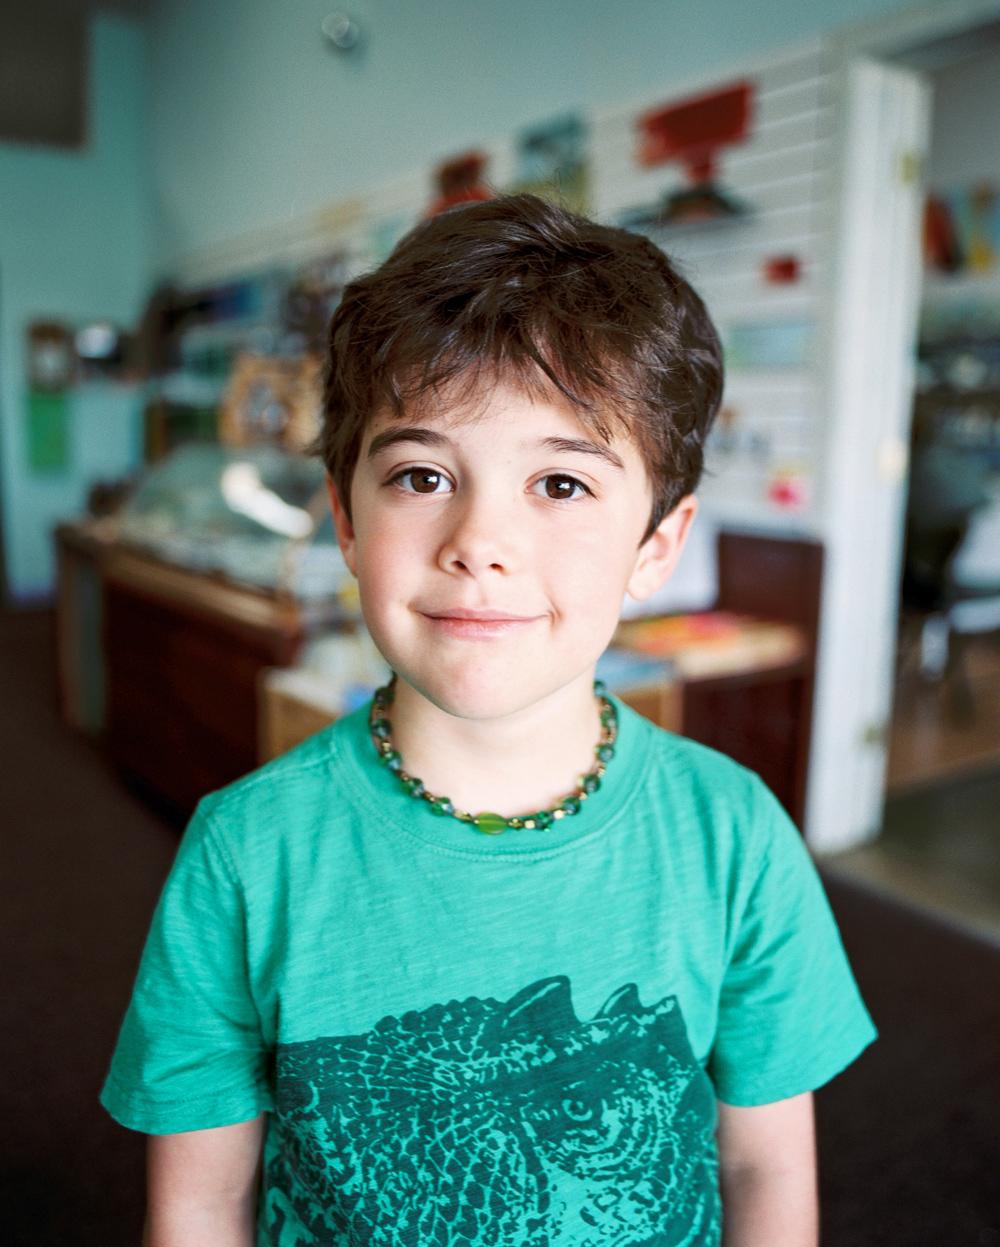 raleigh_child_photographer007.jpg